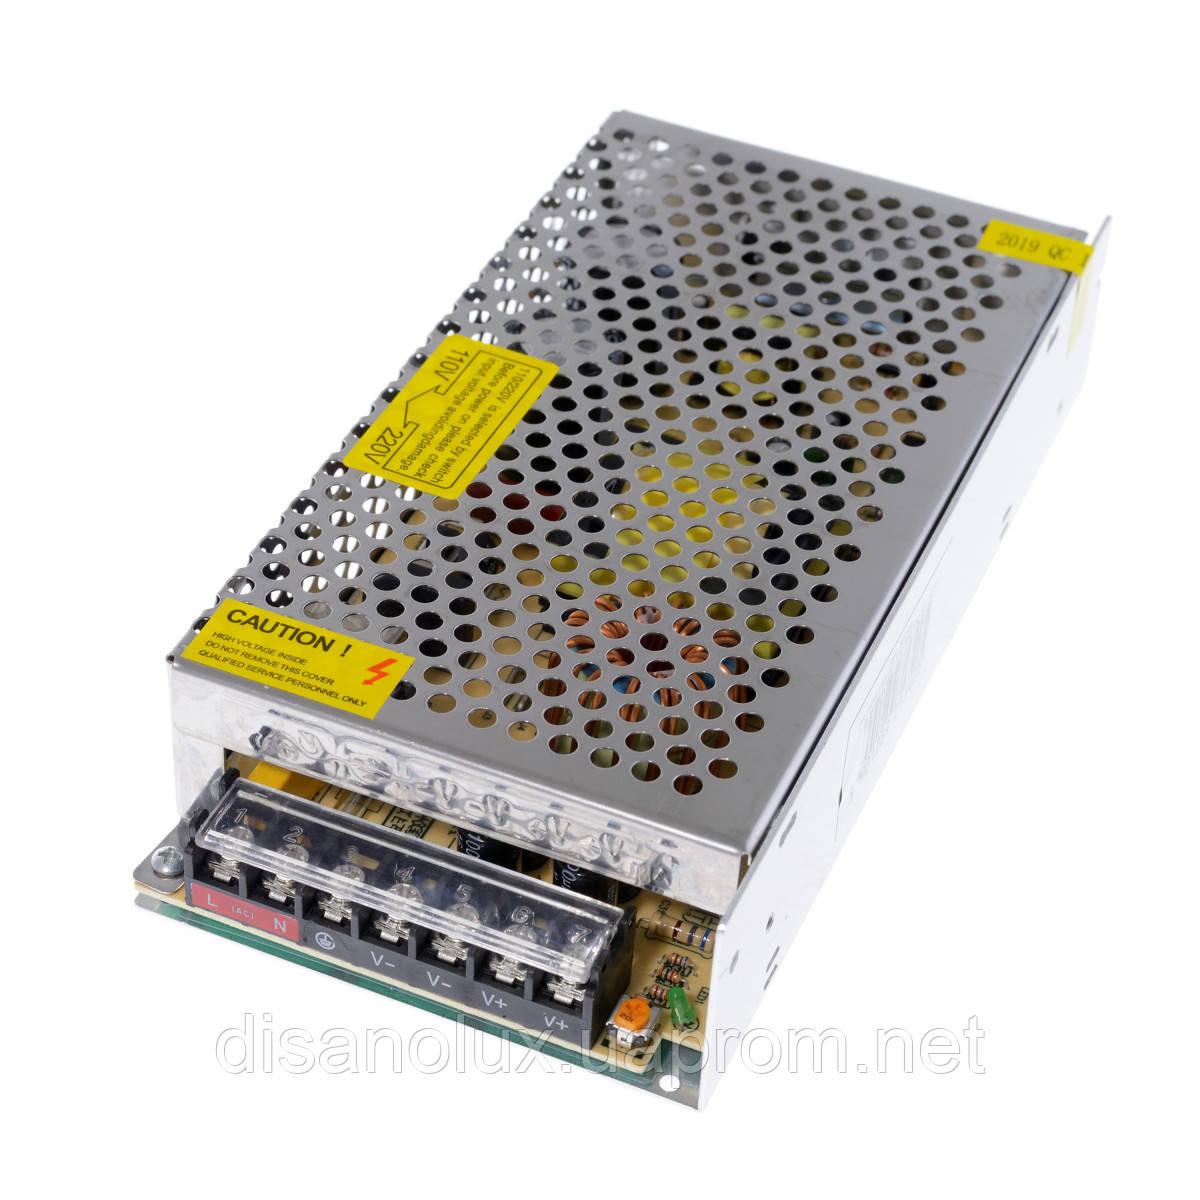 Блок питания DR-150W DC 12V 125A Output led